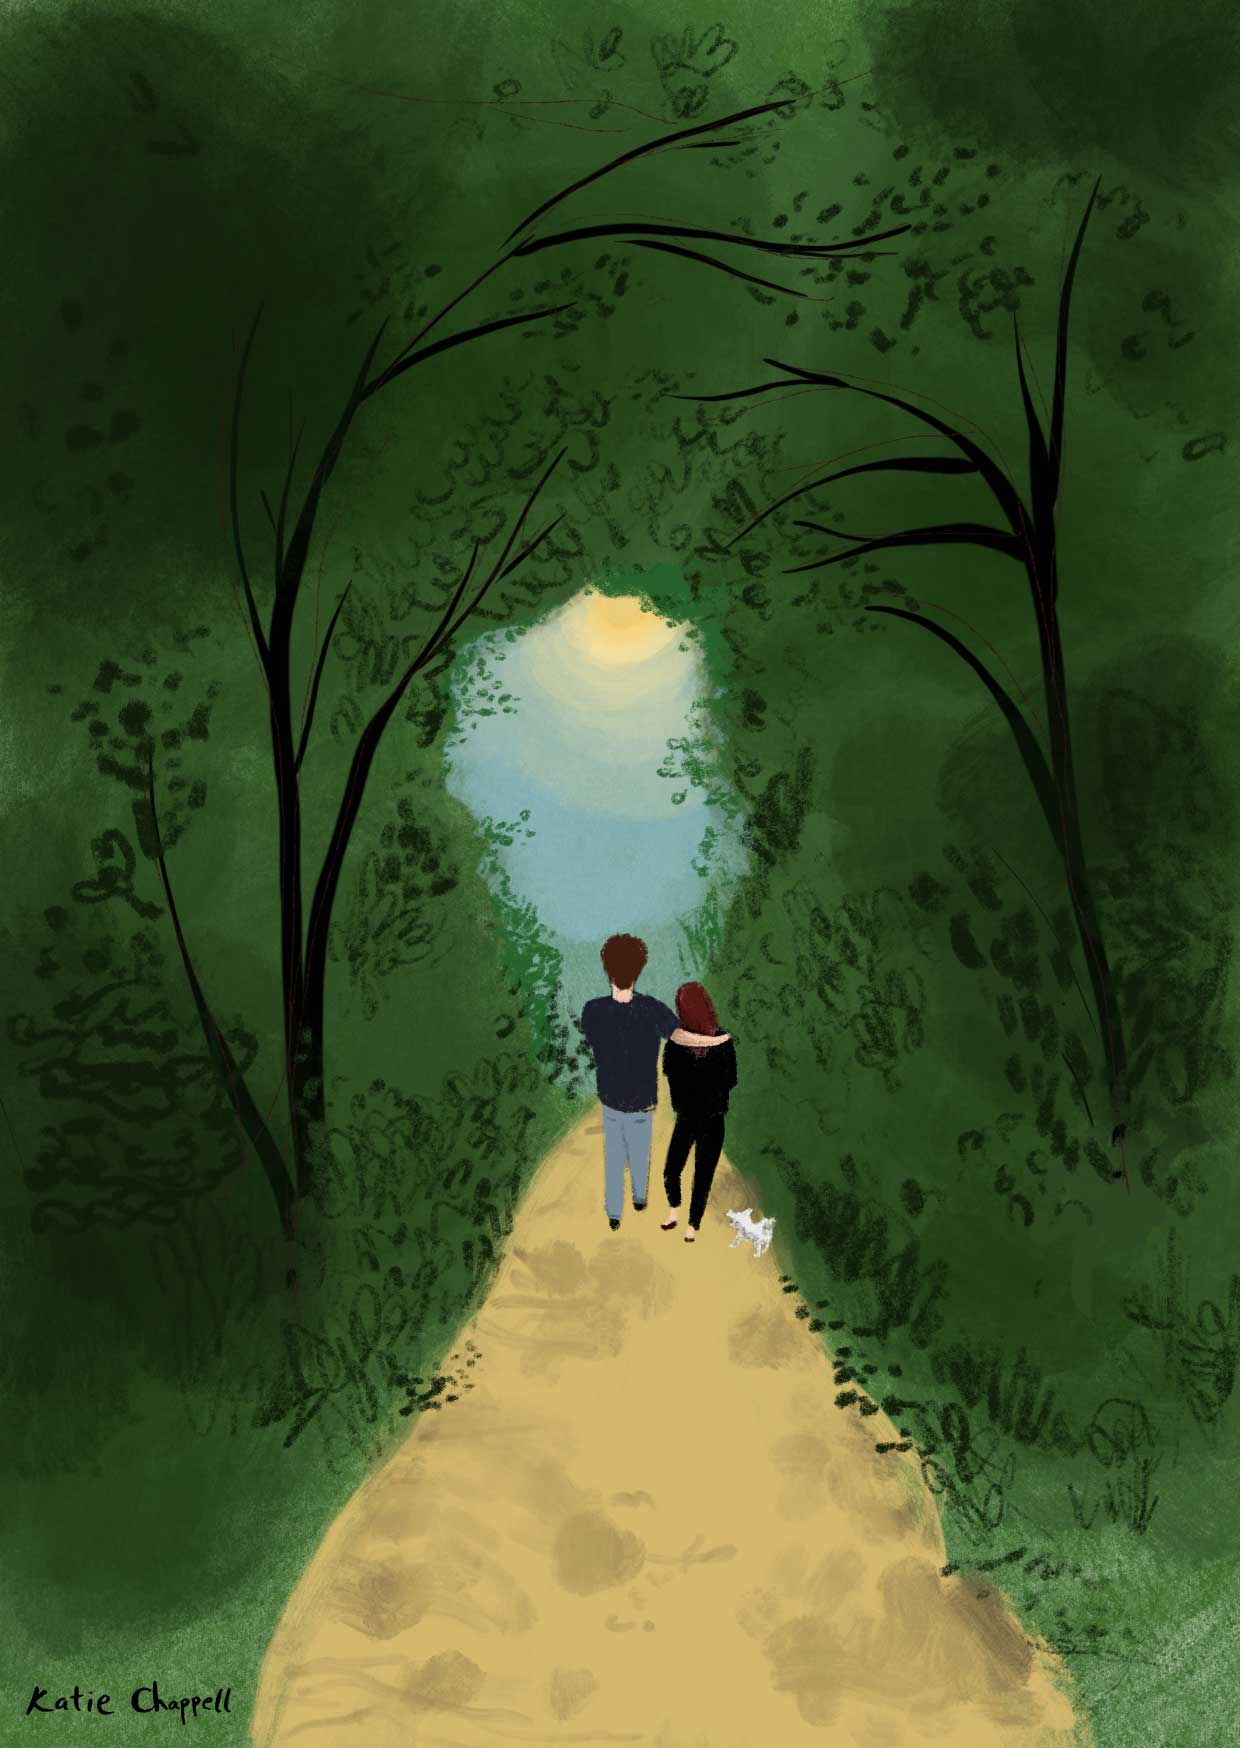 Walking_In_The_Woods-illustration-edinburgh-katie-chappell.jpg